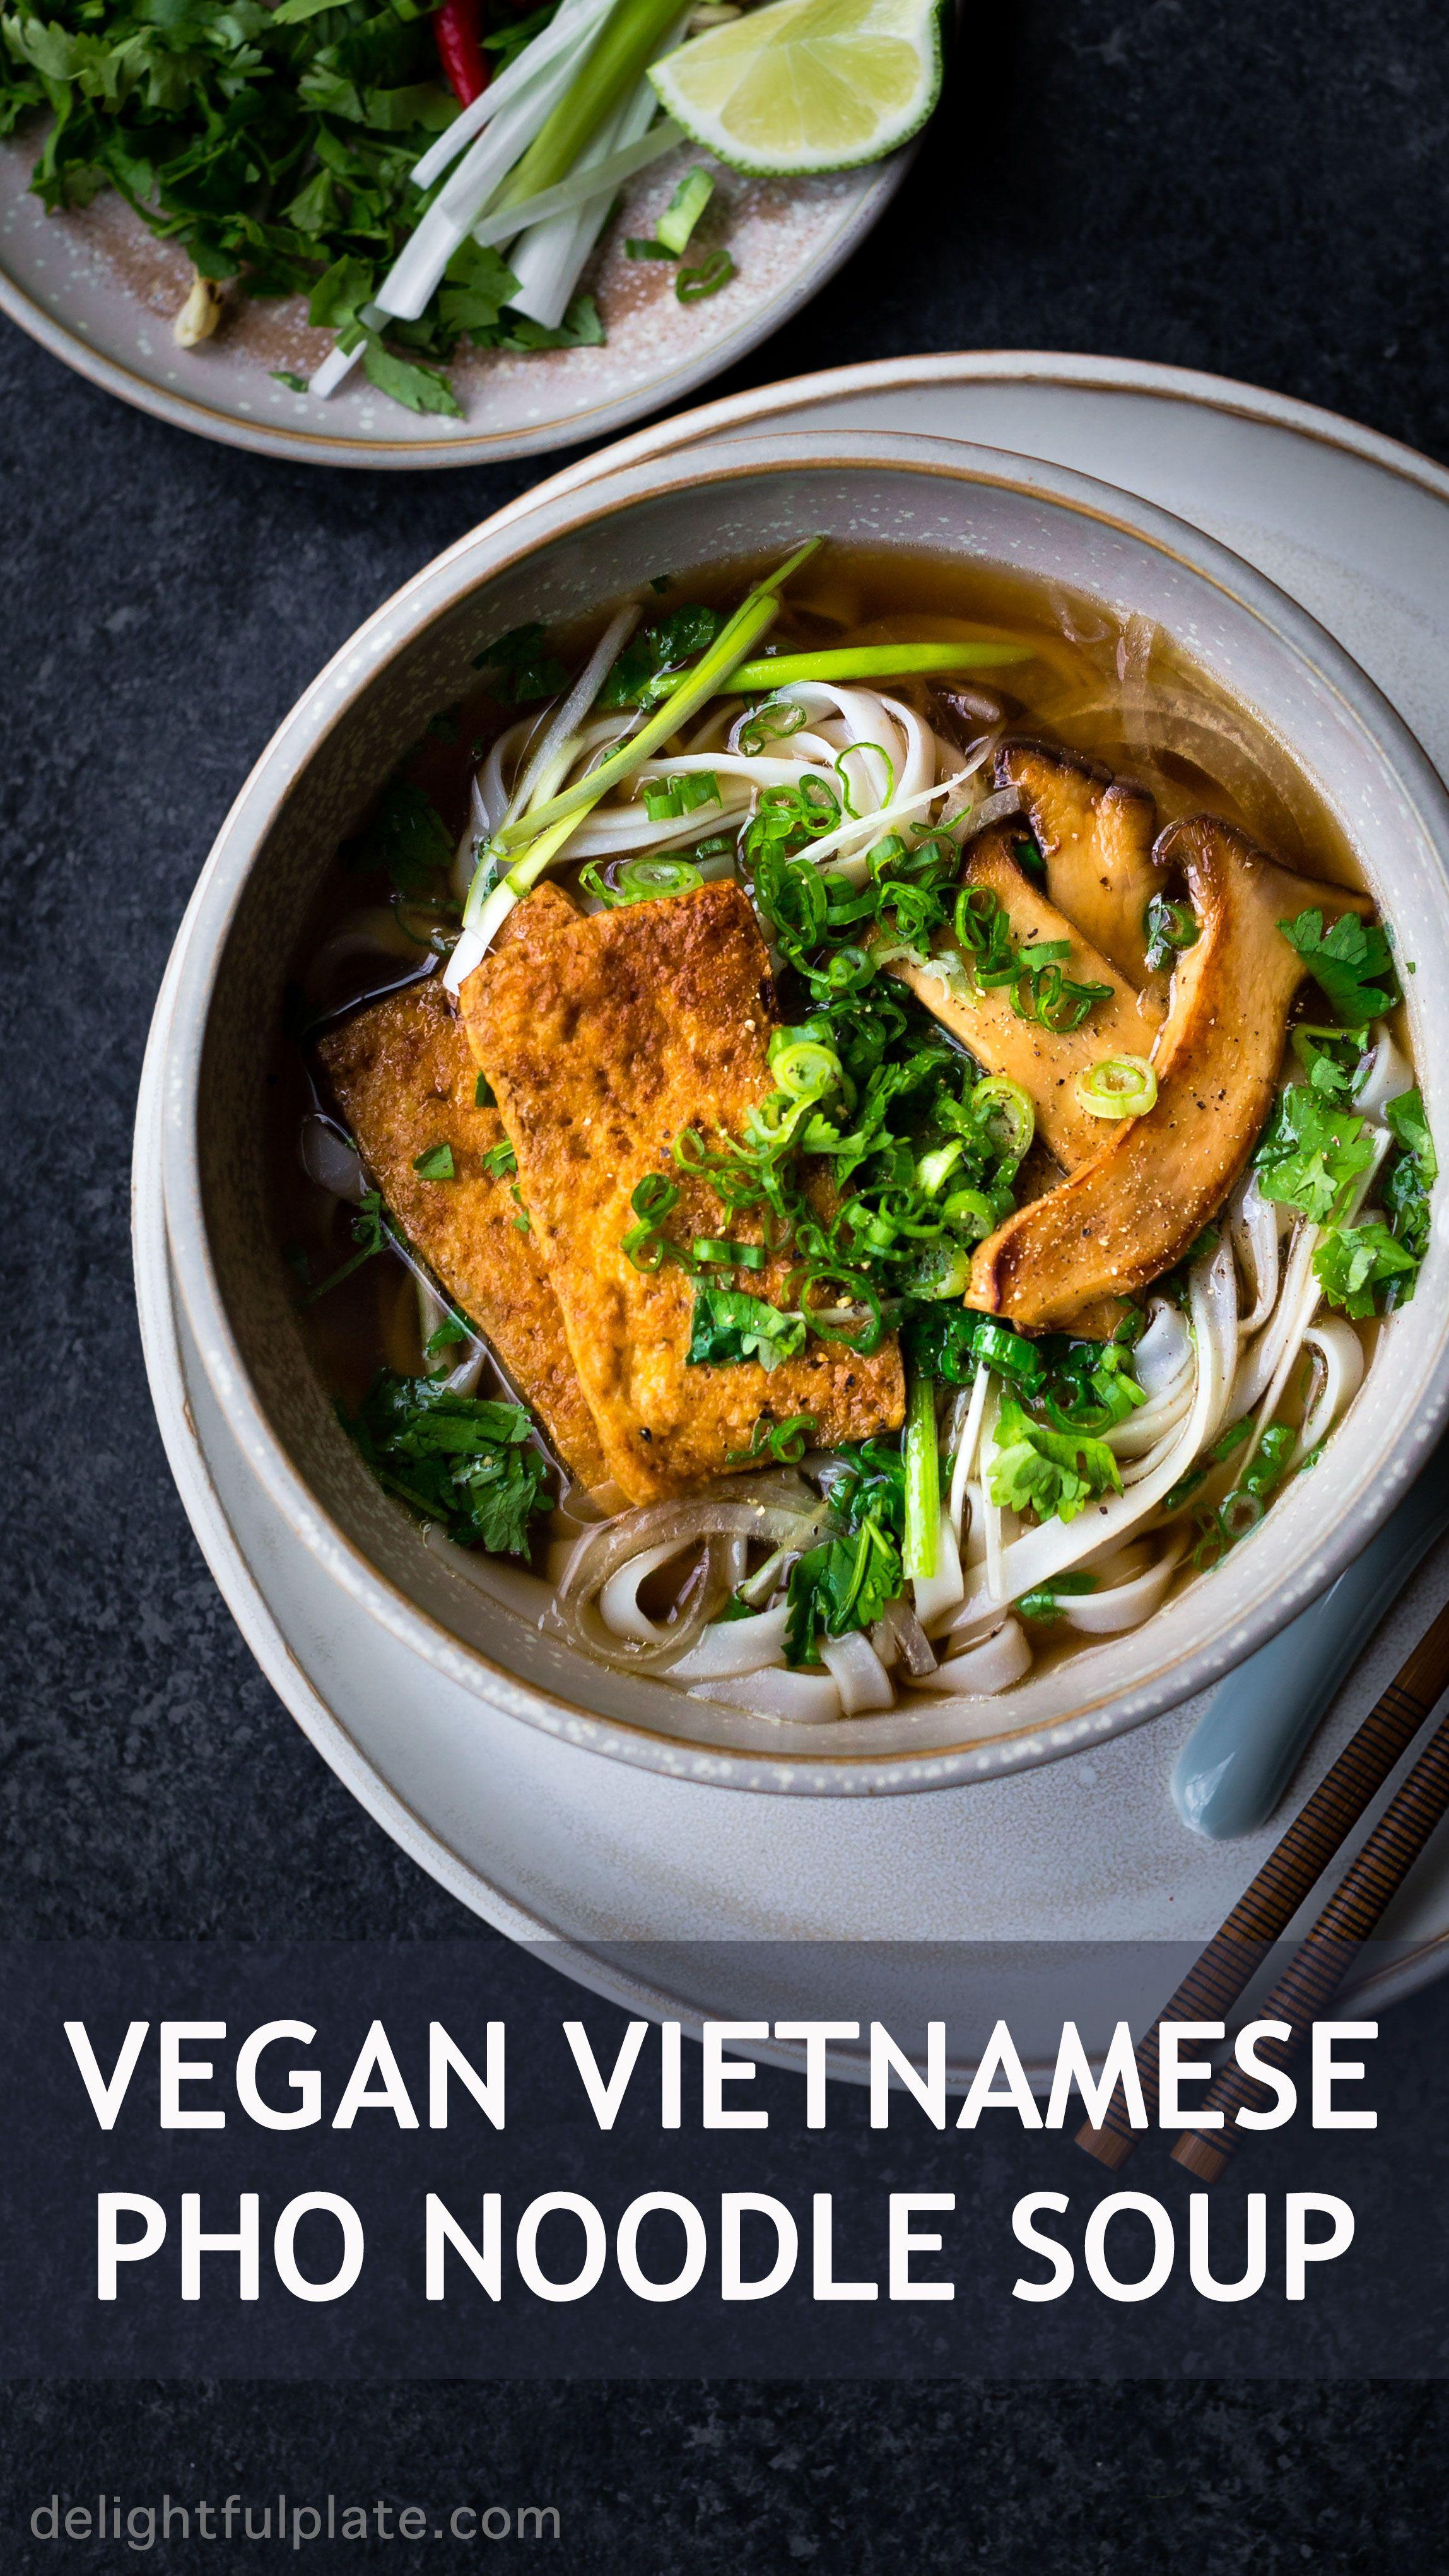 Vegan Pho Noodle Soup Pho Chay